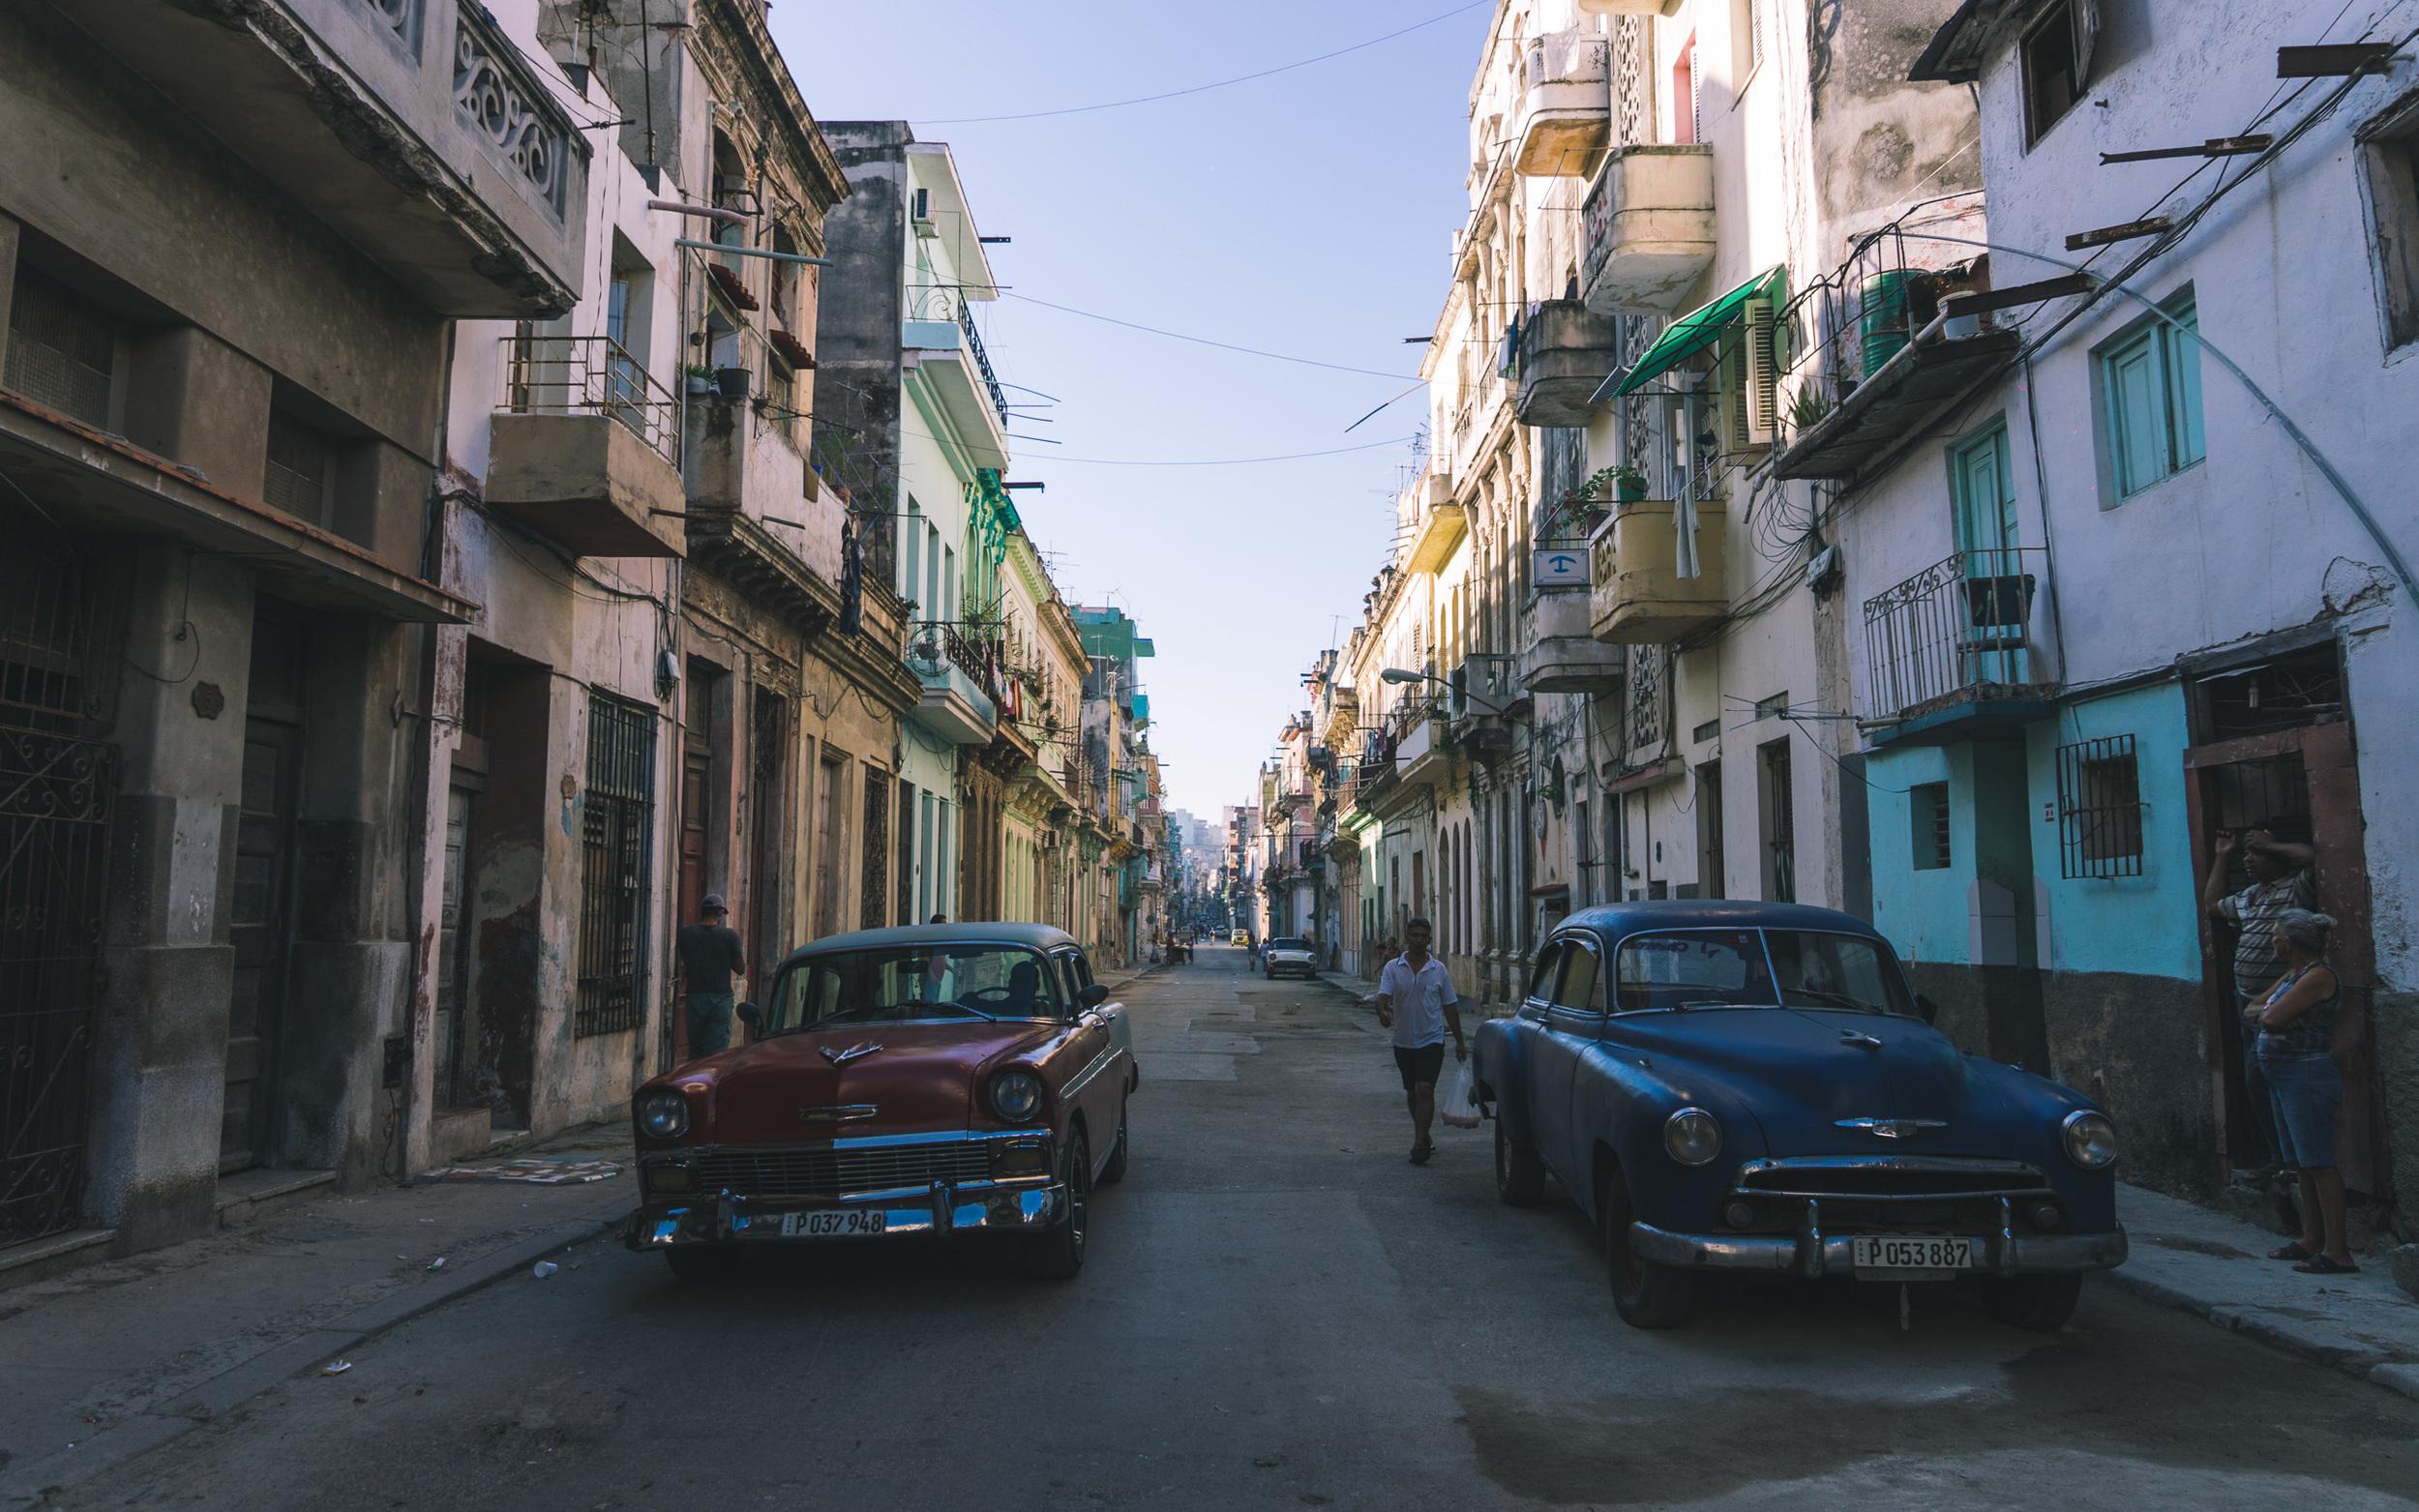 DeClaro-Photography-Cuba-02744.jpg